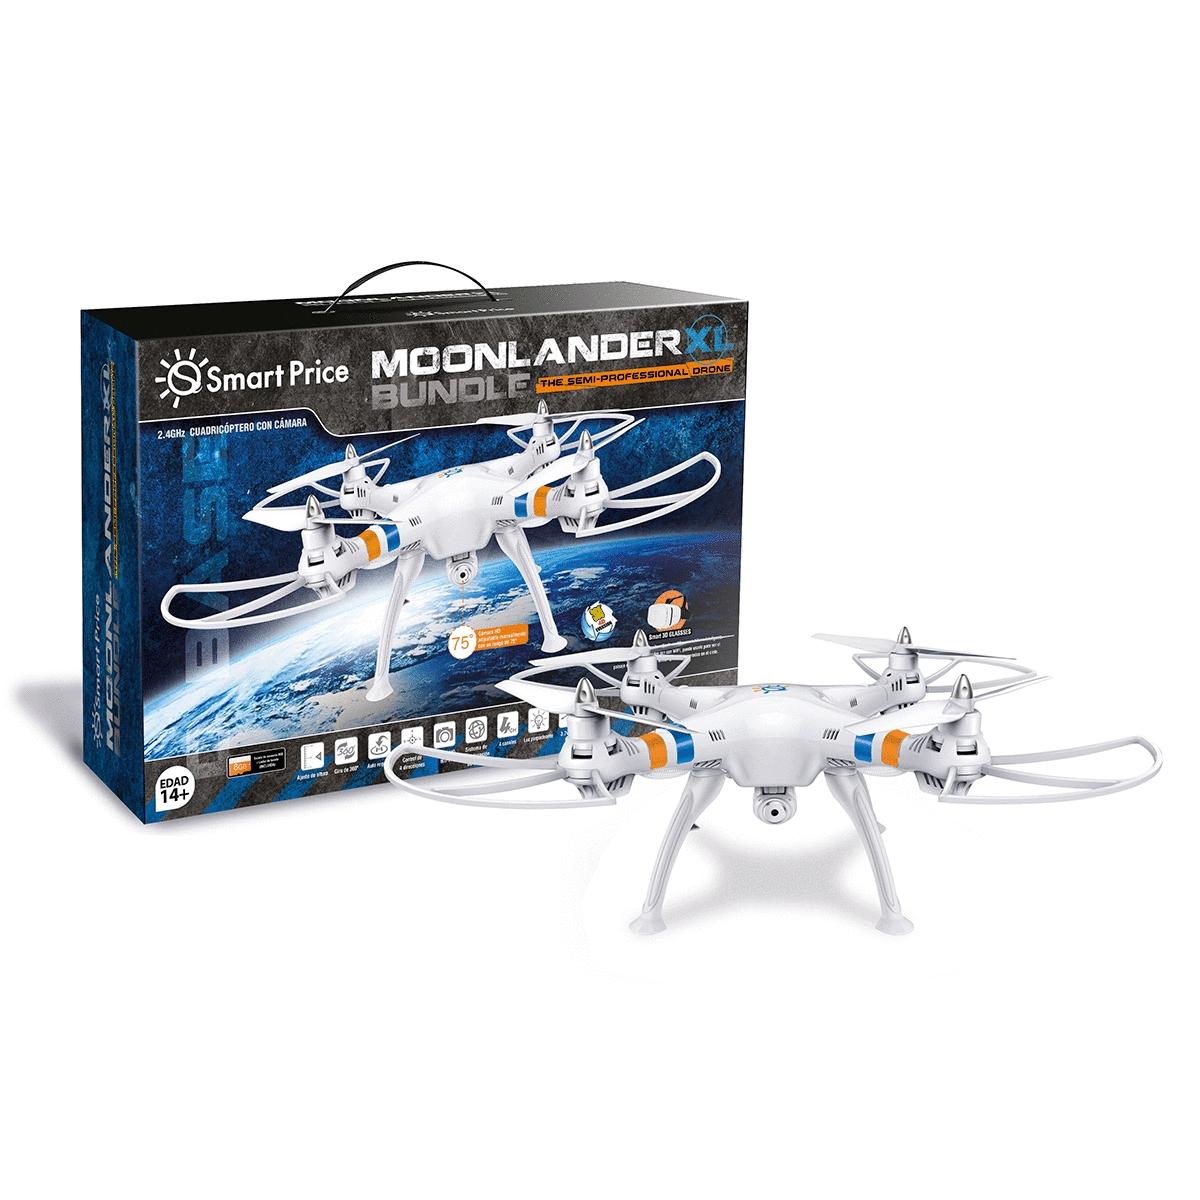 Radioshack - DRONE SMART-TOYS MOONLANDER XL (WIFI, VR GLASSES)